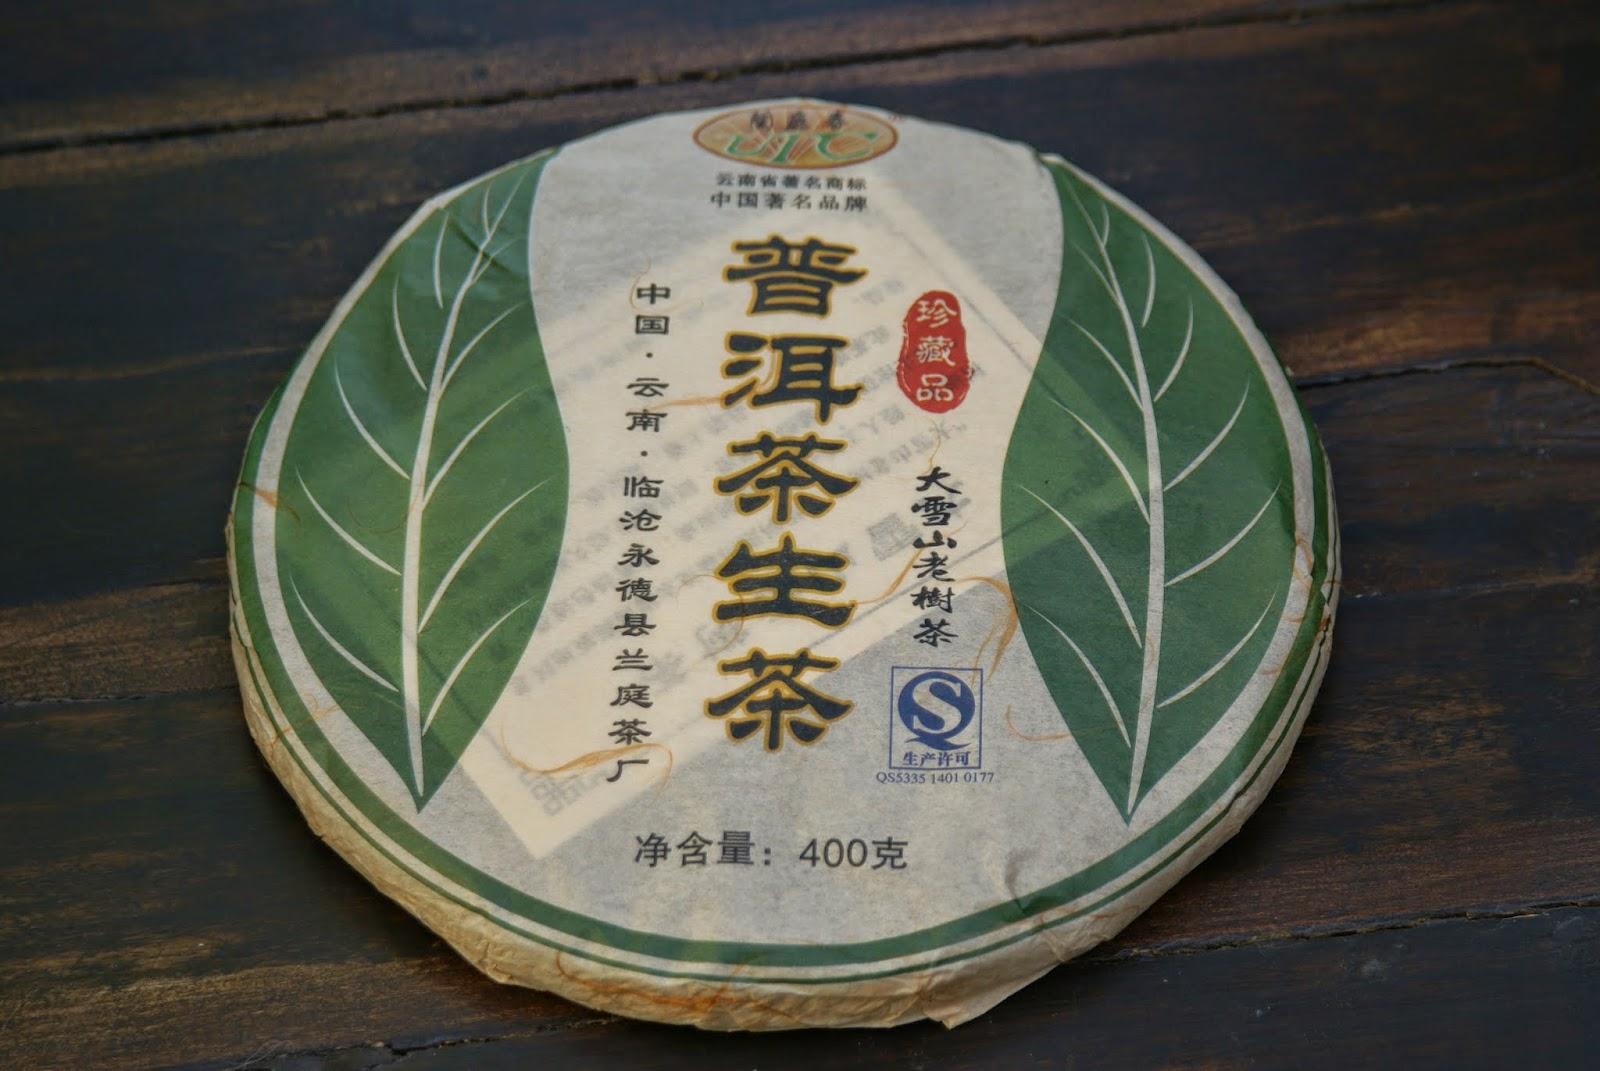 galette de puerh sheng